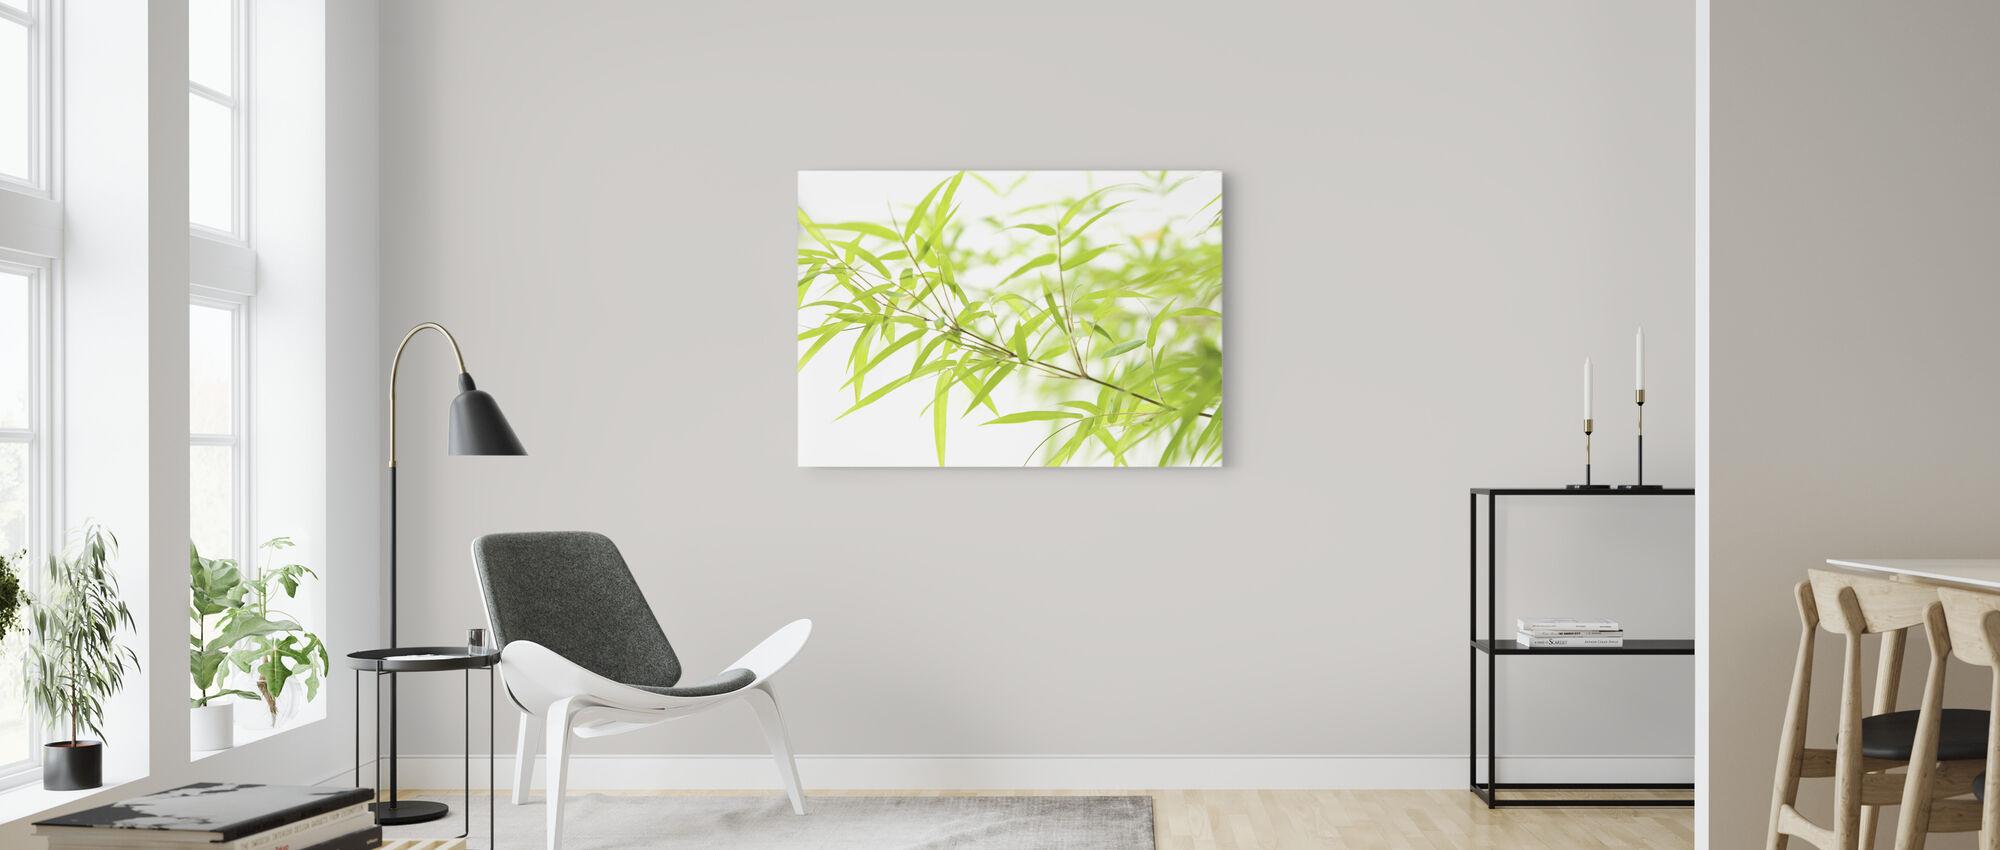 Miniature Bamboo - Canvas print - Living Room